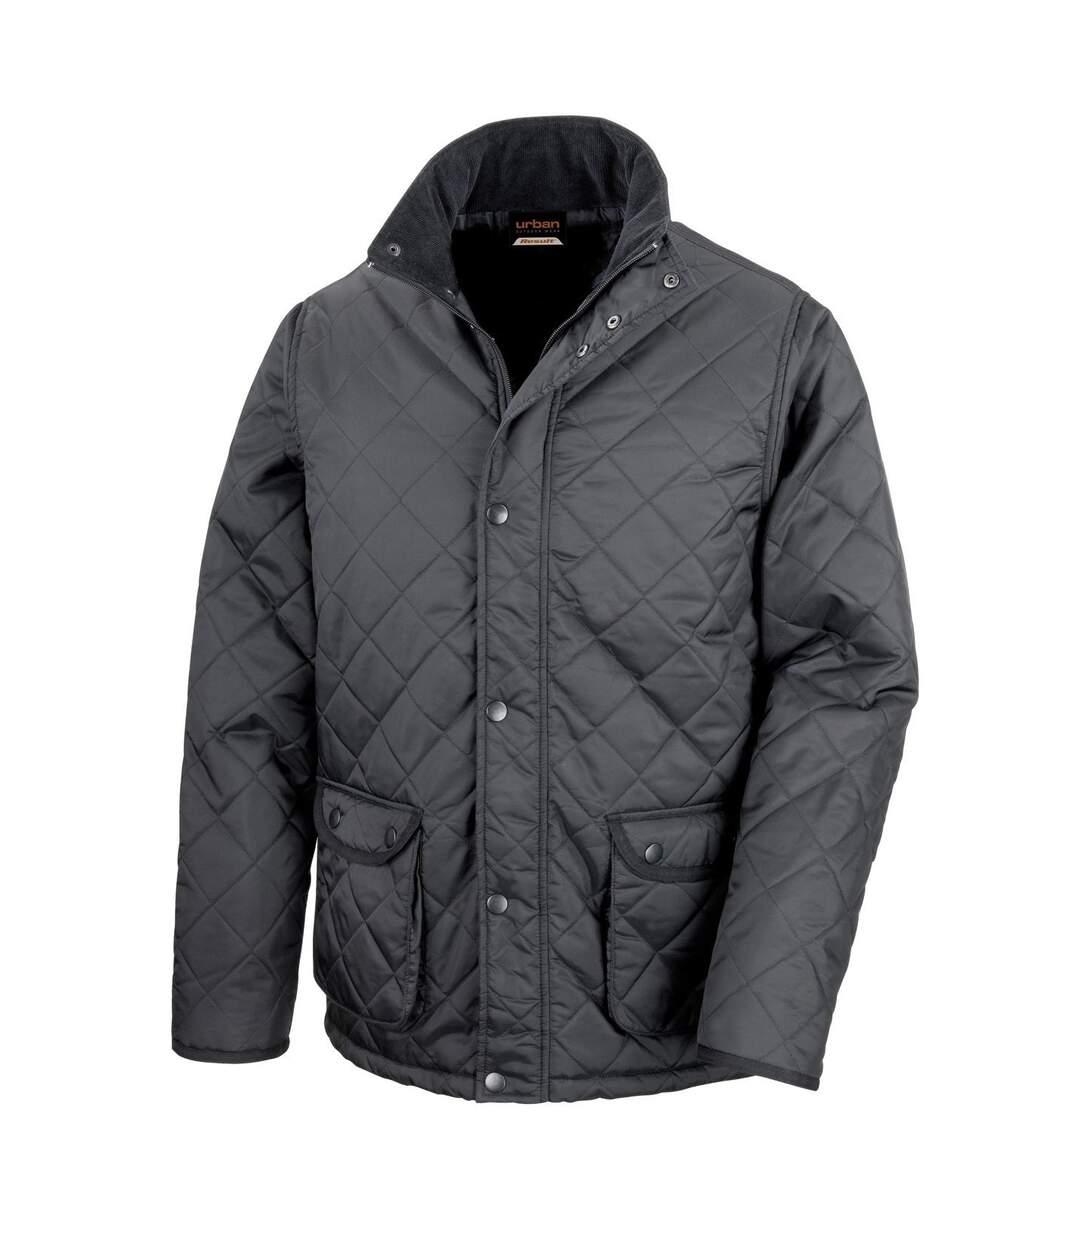 Result Mens Urban Cheltenham Water Repellent Jacket (Black) - UTBC892